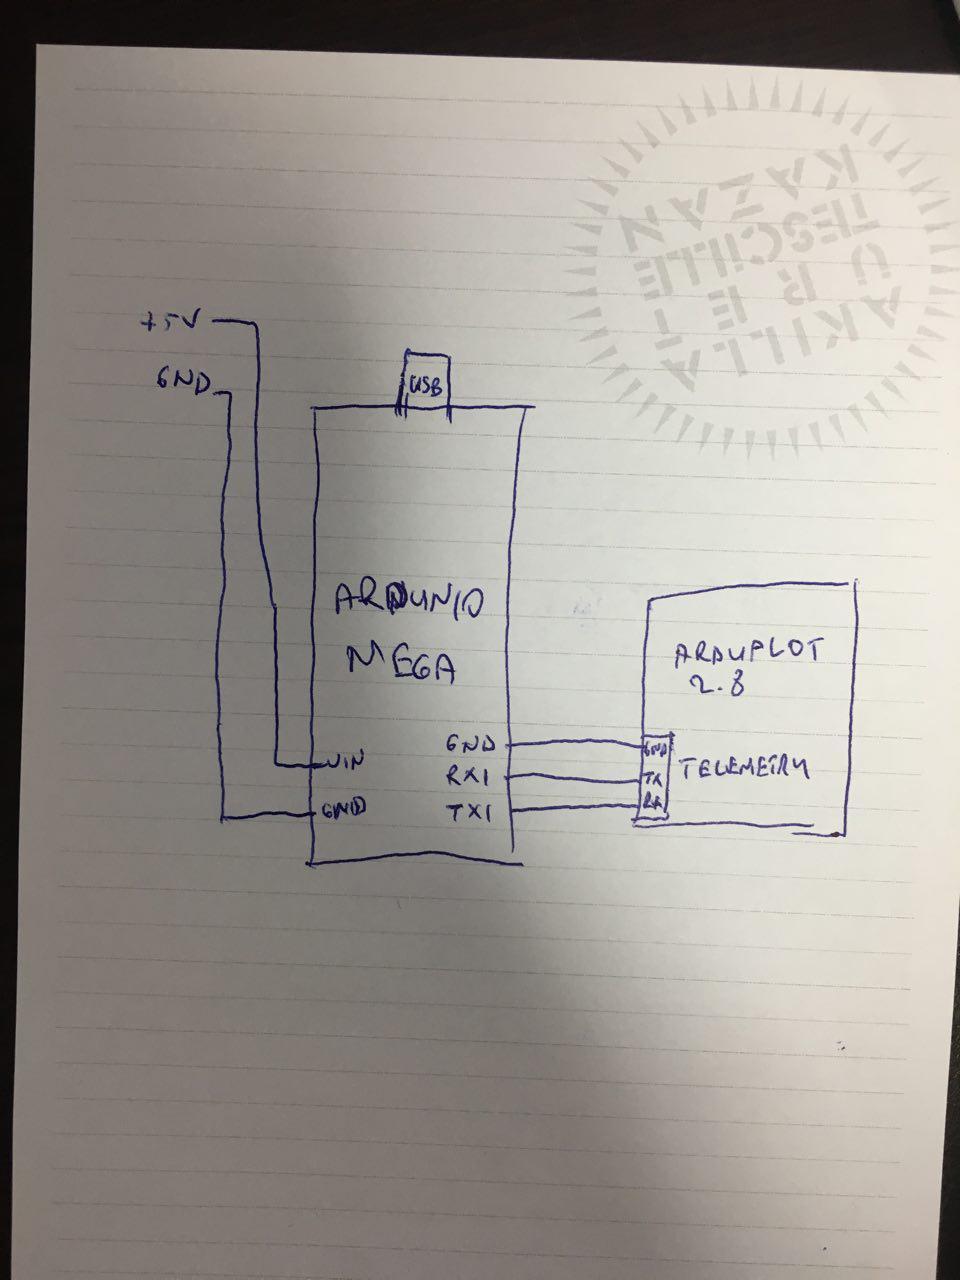 MAVLink and Arduino: step by step - Blog - ArduPilot Discourse